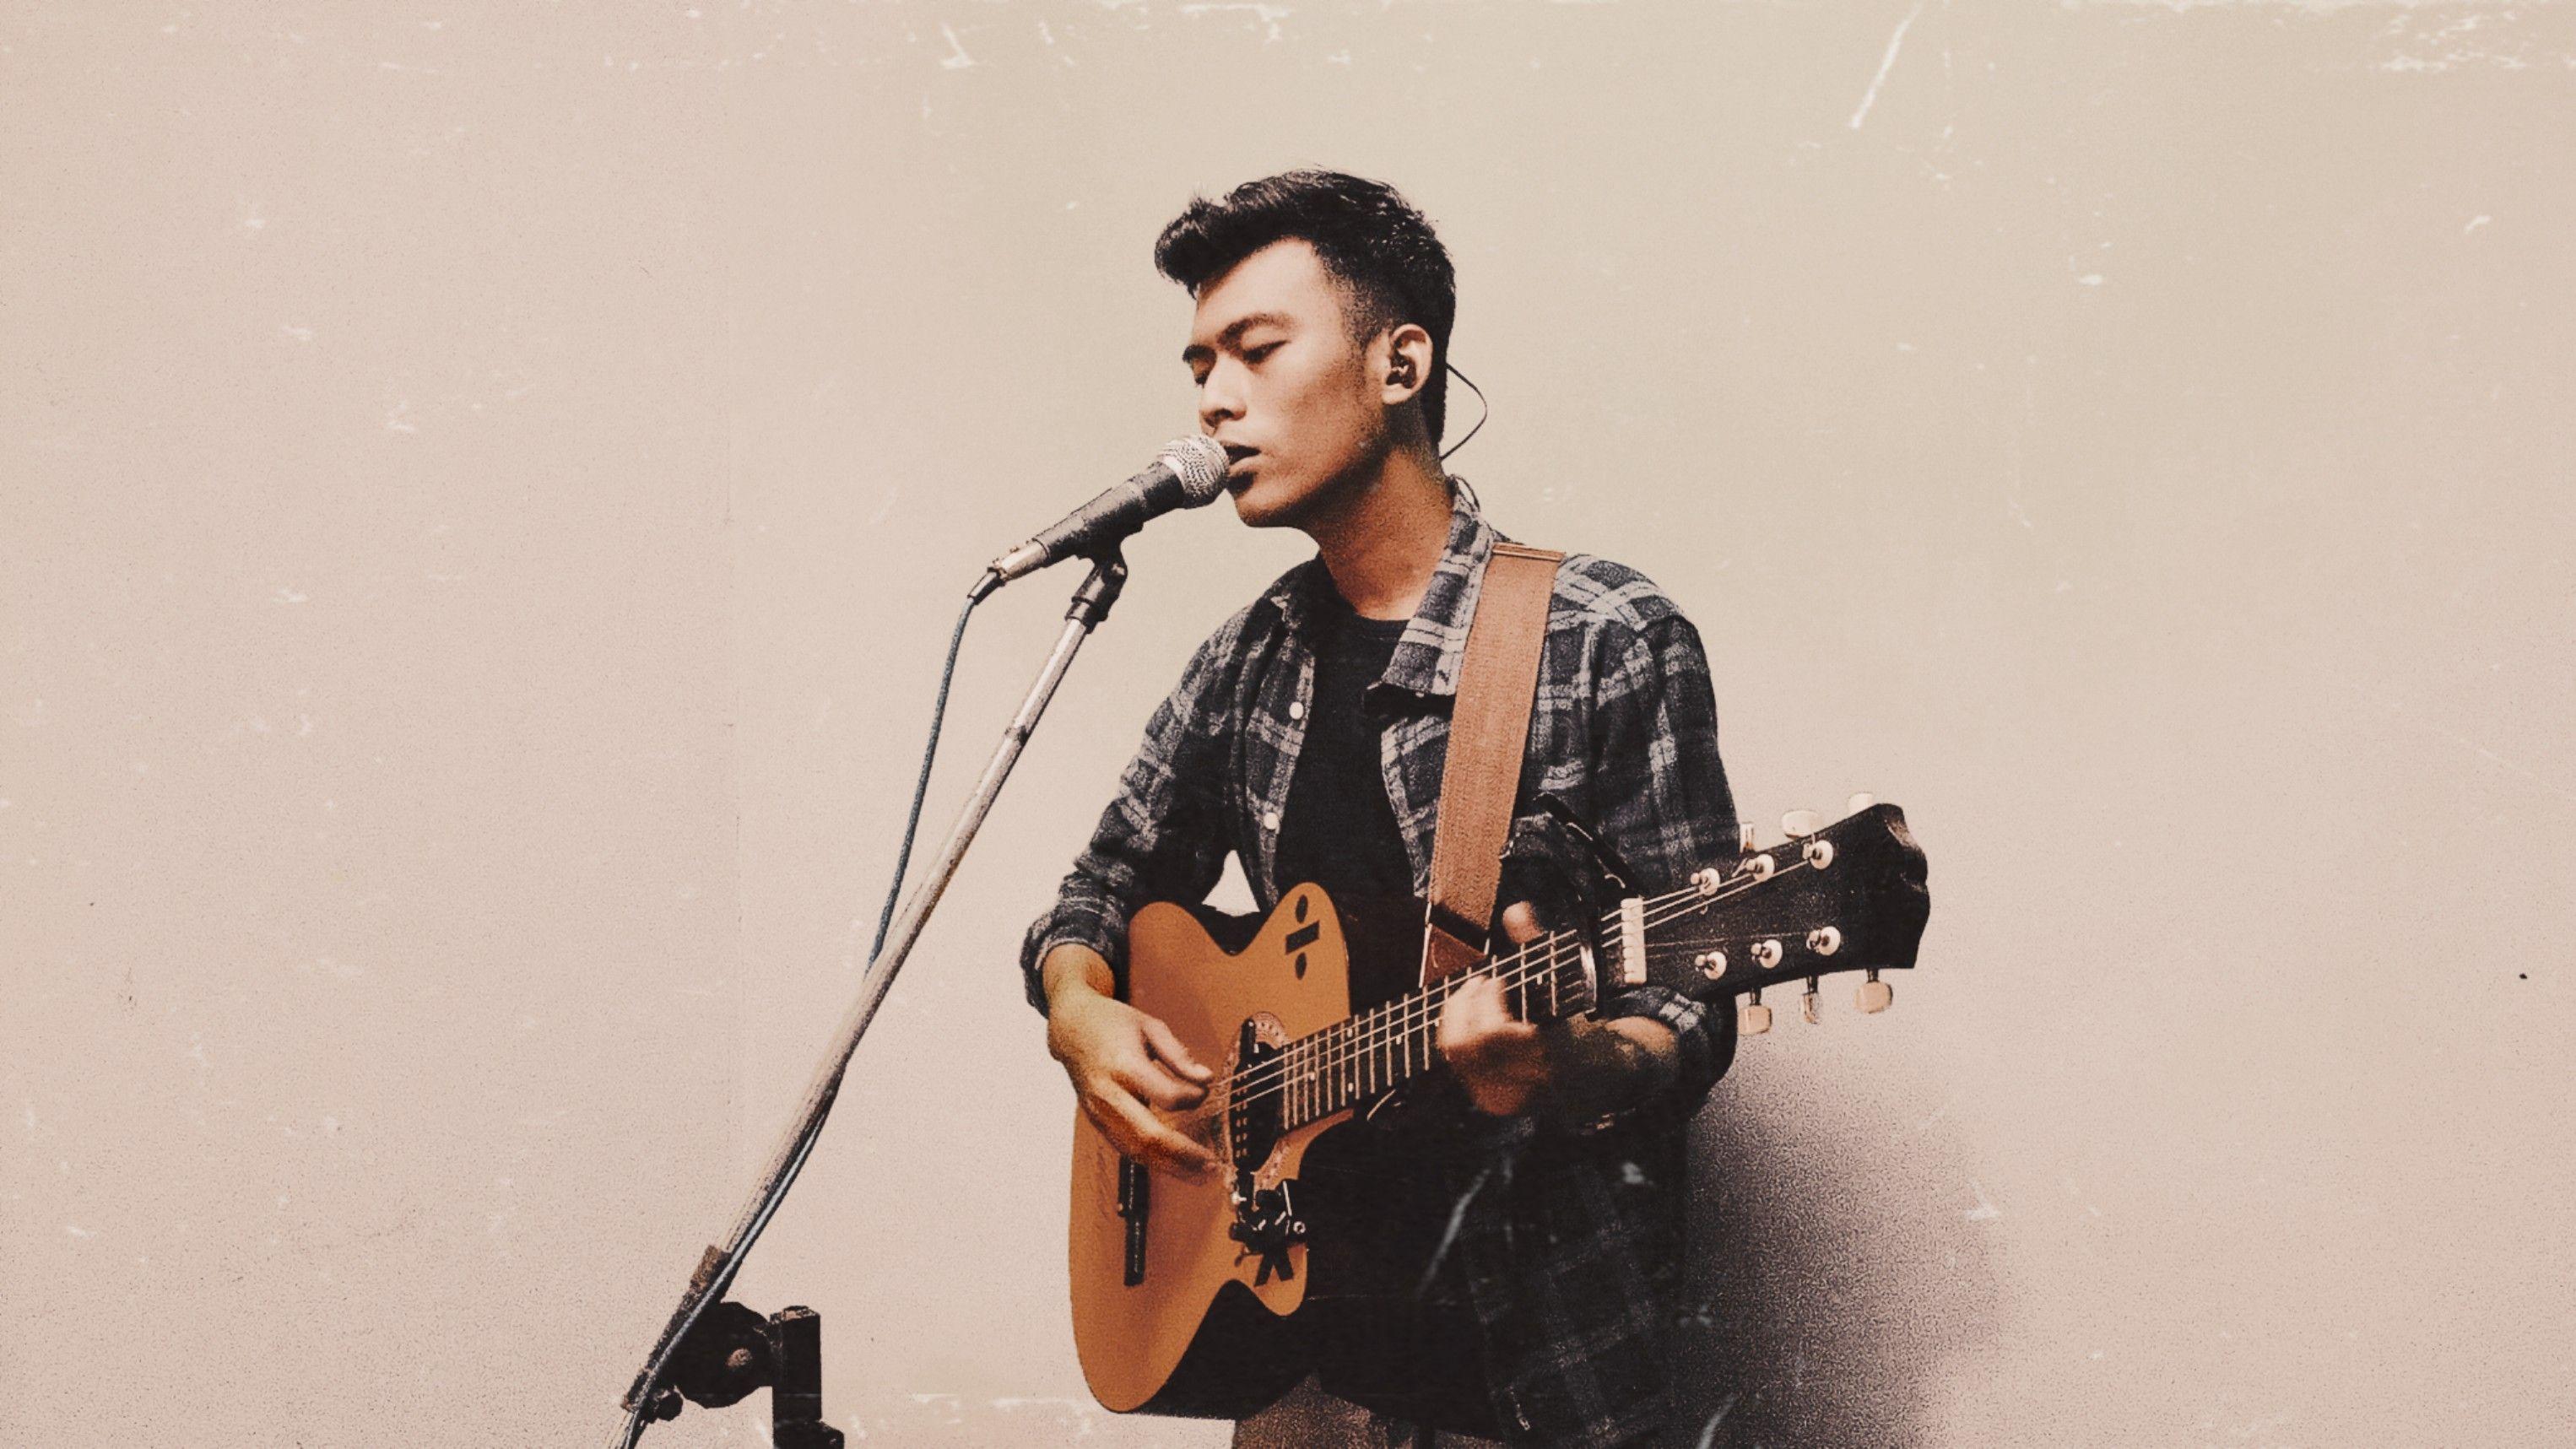 Jago Bikin Lagu dan Puisi, Ternyata Billy Surya Dilaga Lulusan Sastra Inggris!